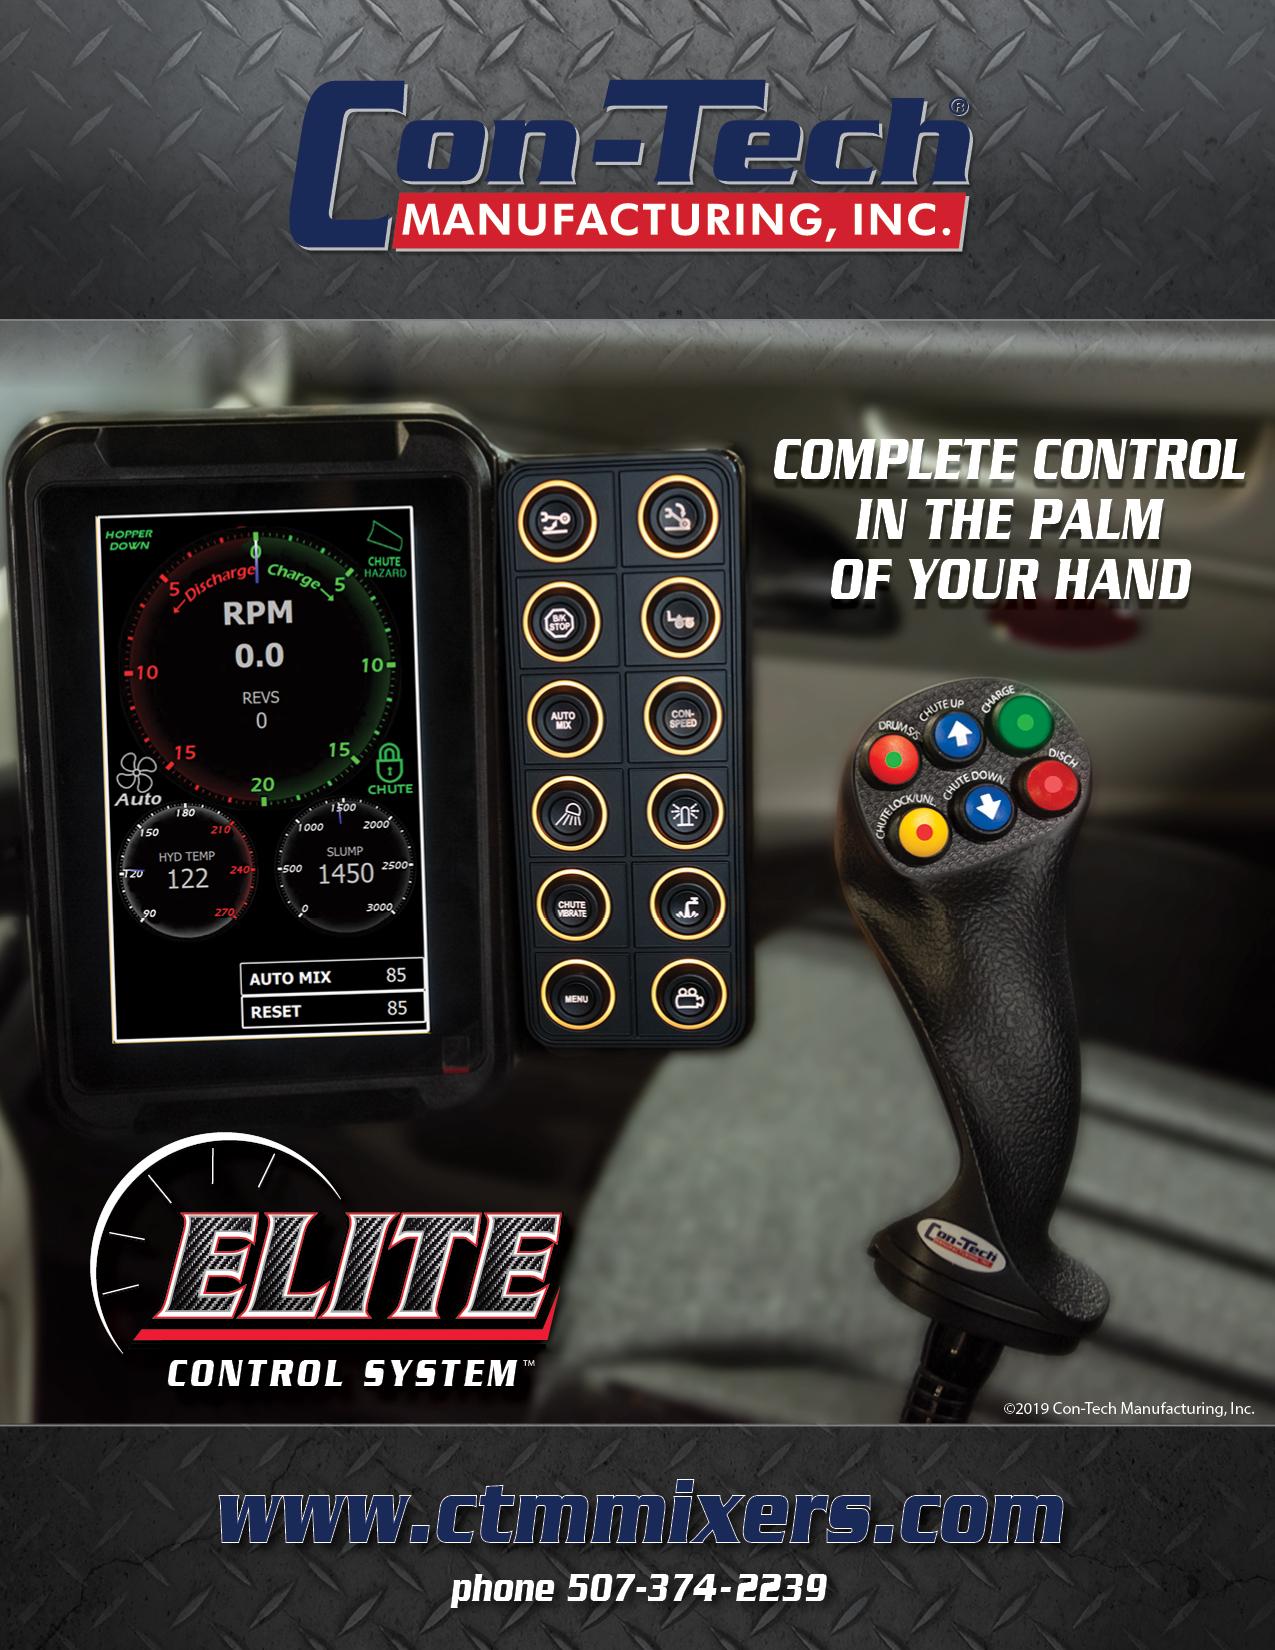 elite-control-system-brochure-2019-f.jpg